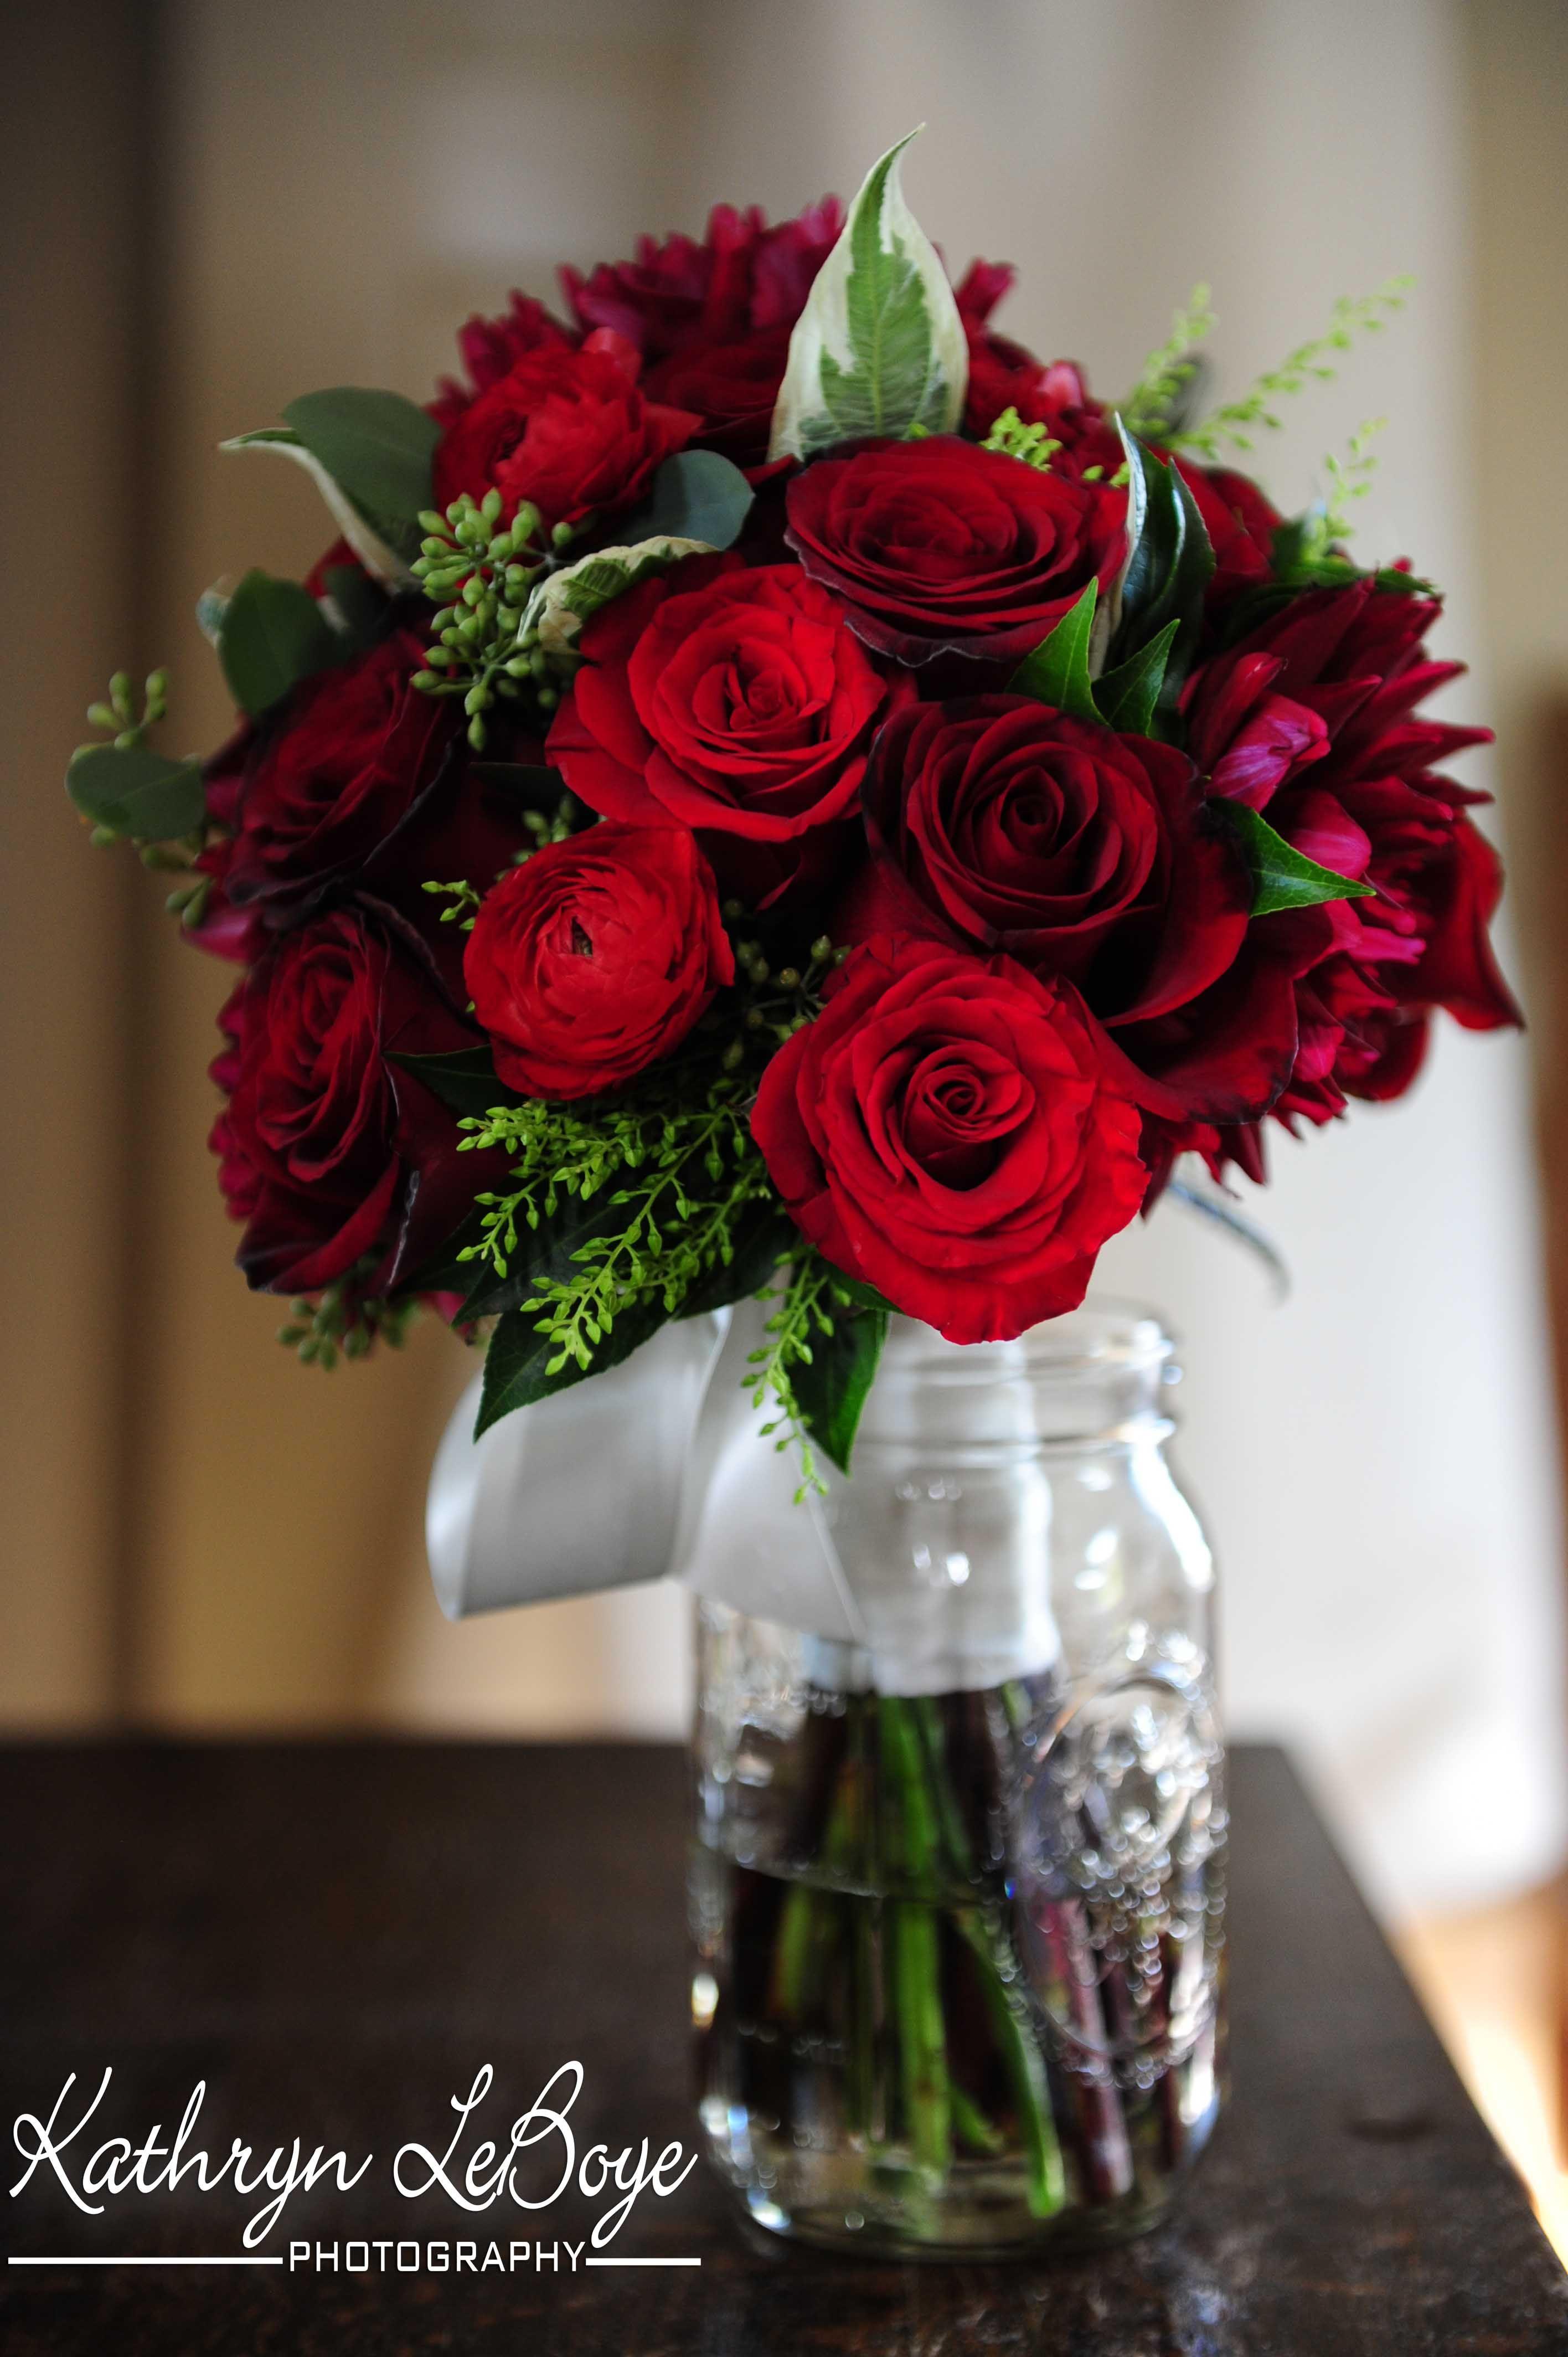 McMenamins Edgefield Wedding Photography, Kathryn LeBoye Photography, Bride's flower bouquet photo